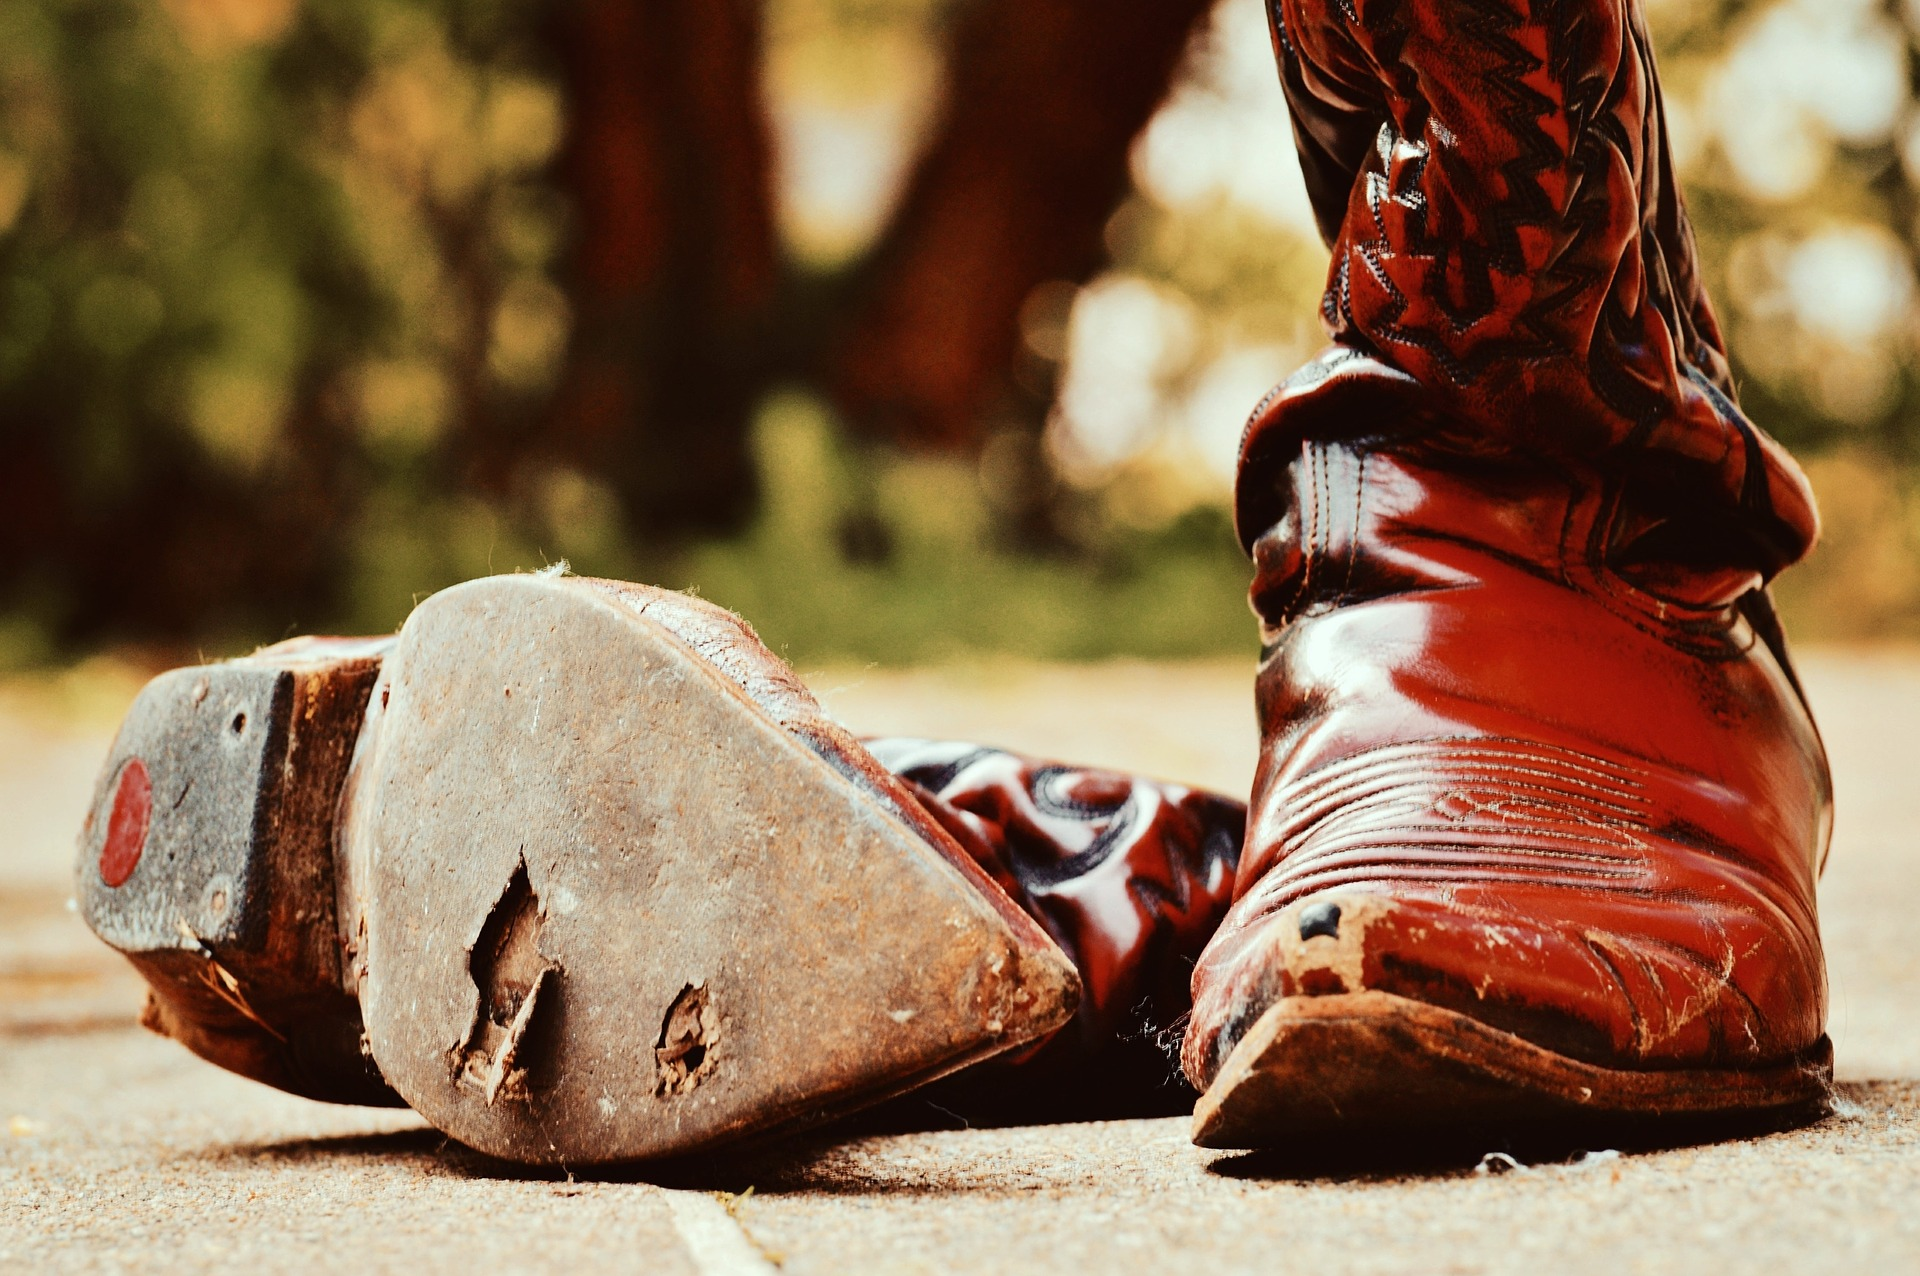 cowboy-boots-975113_1920.jpg